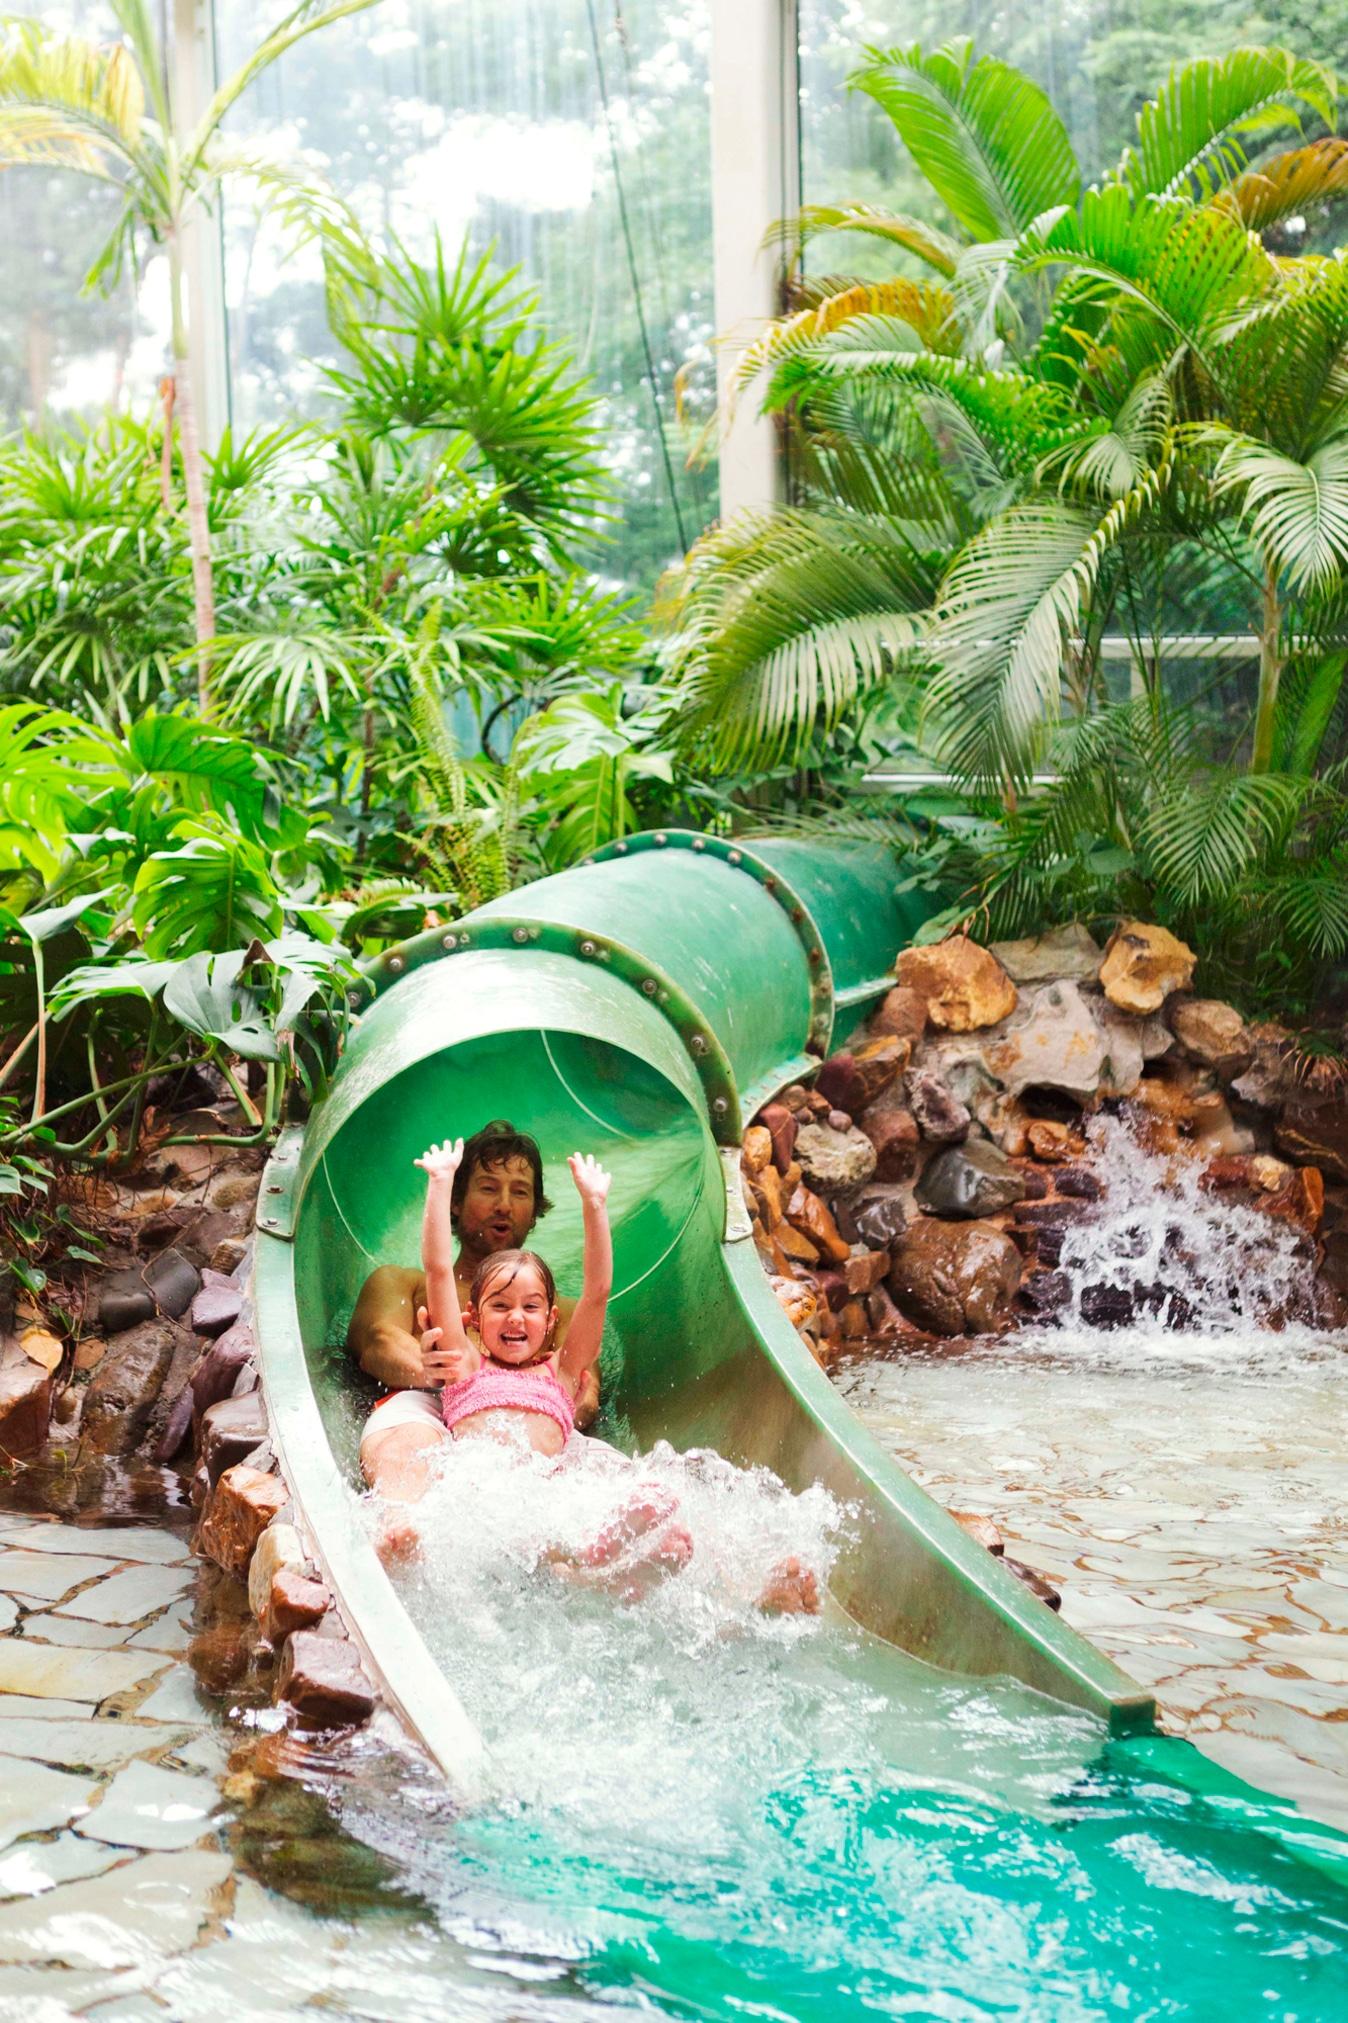 Water slide at Landal de Lommerbergen